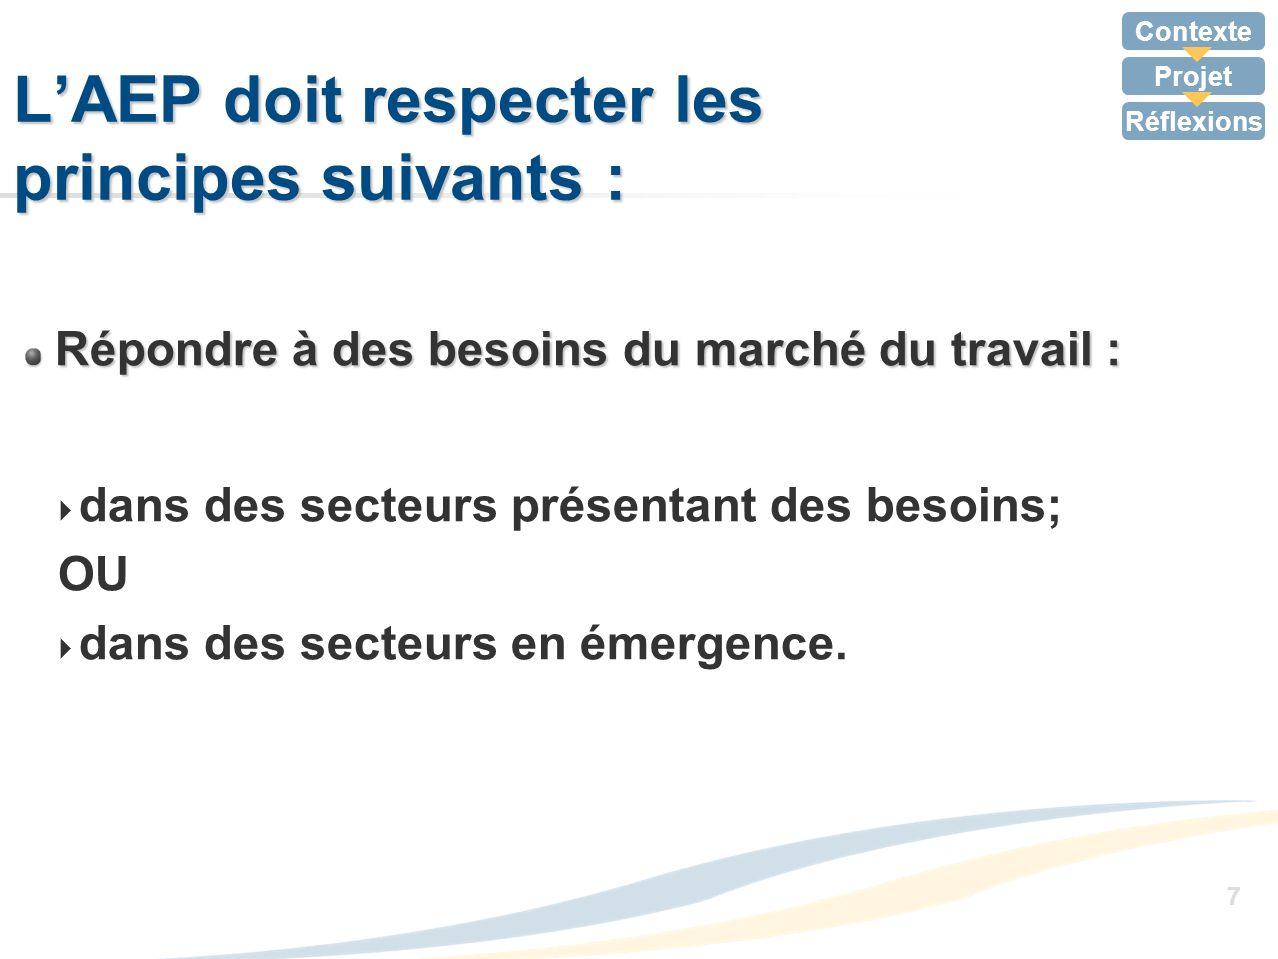 L'AEP doit respecter les principes suivants :